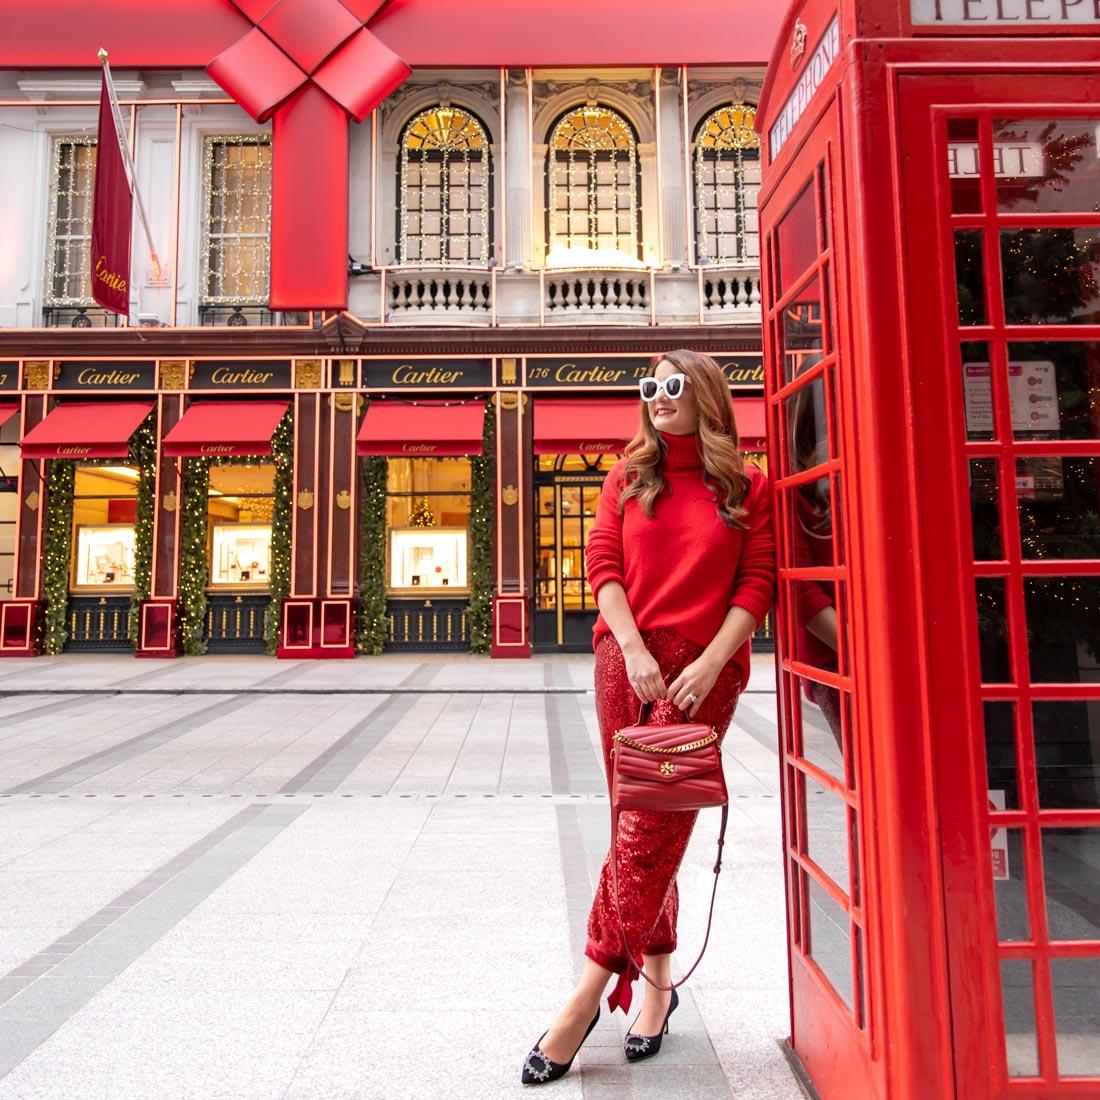 Jennifer Lake Cartier London